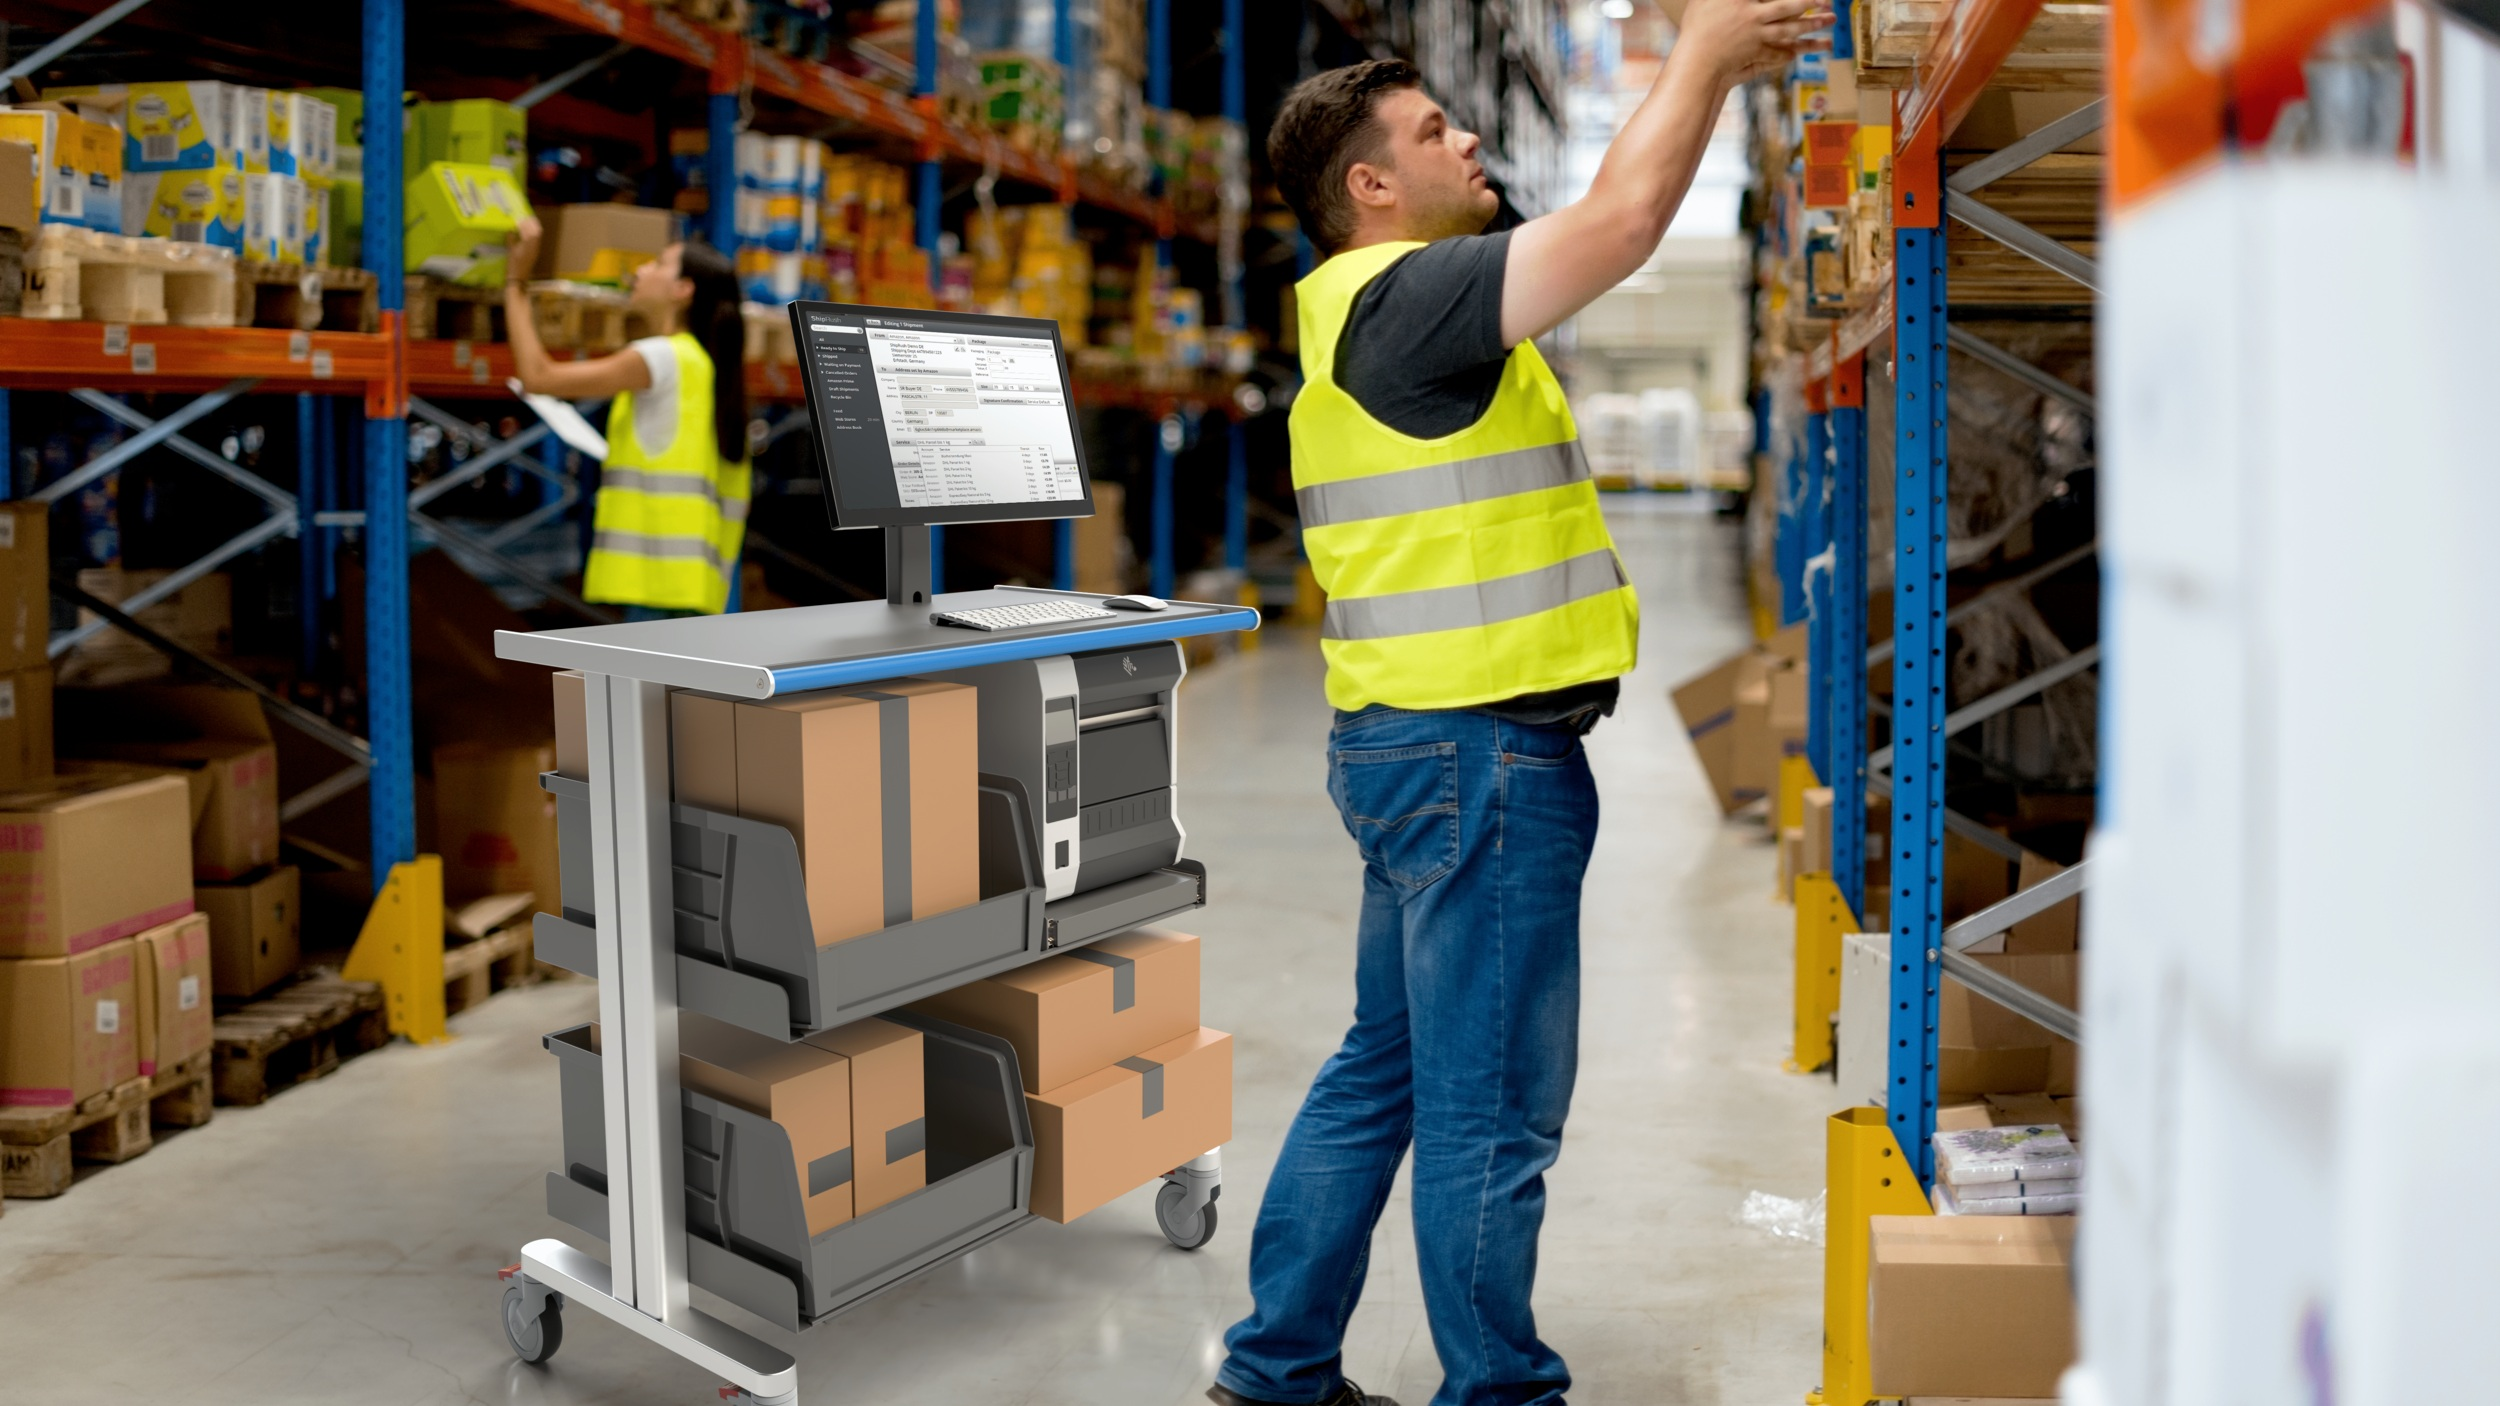 warehouse-fulfillment-center-order-picking-cart